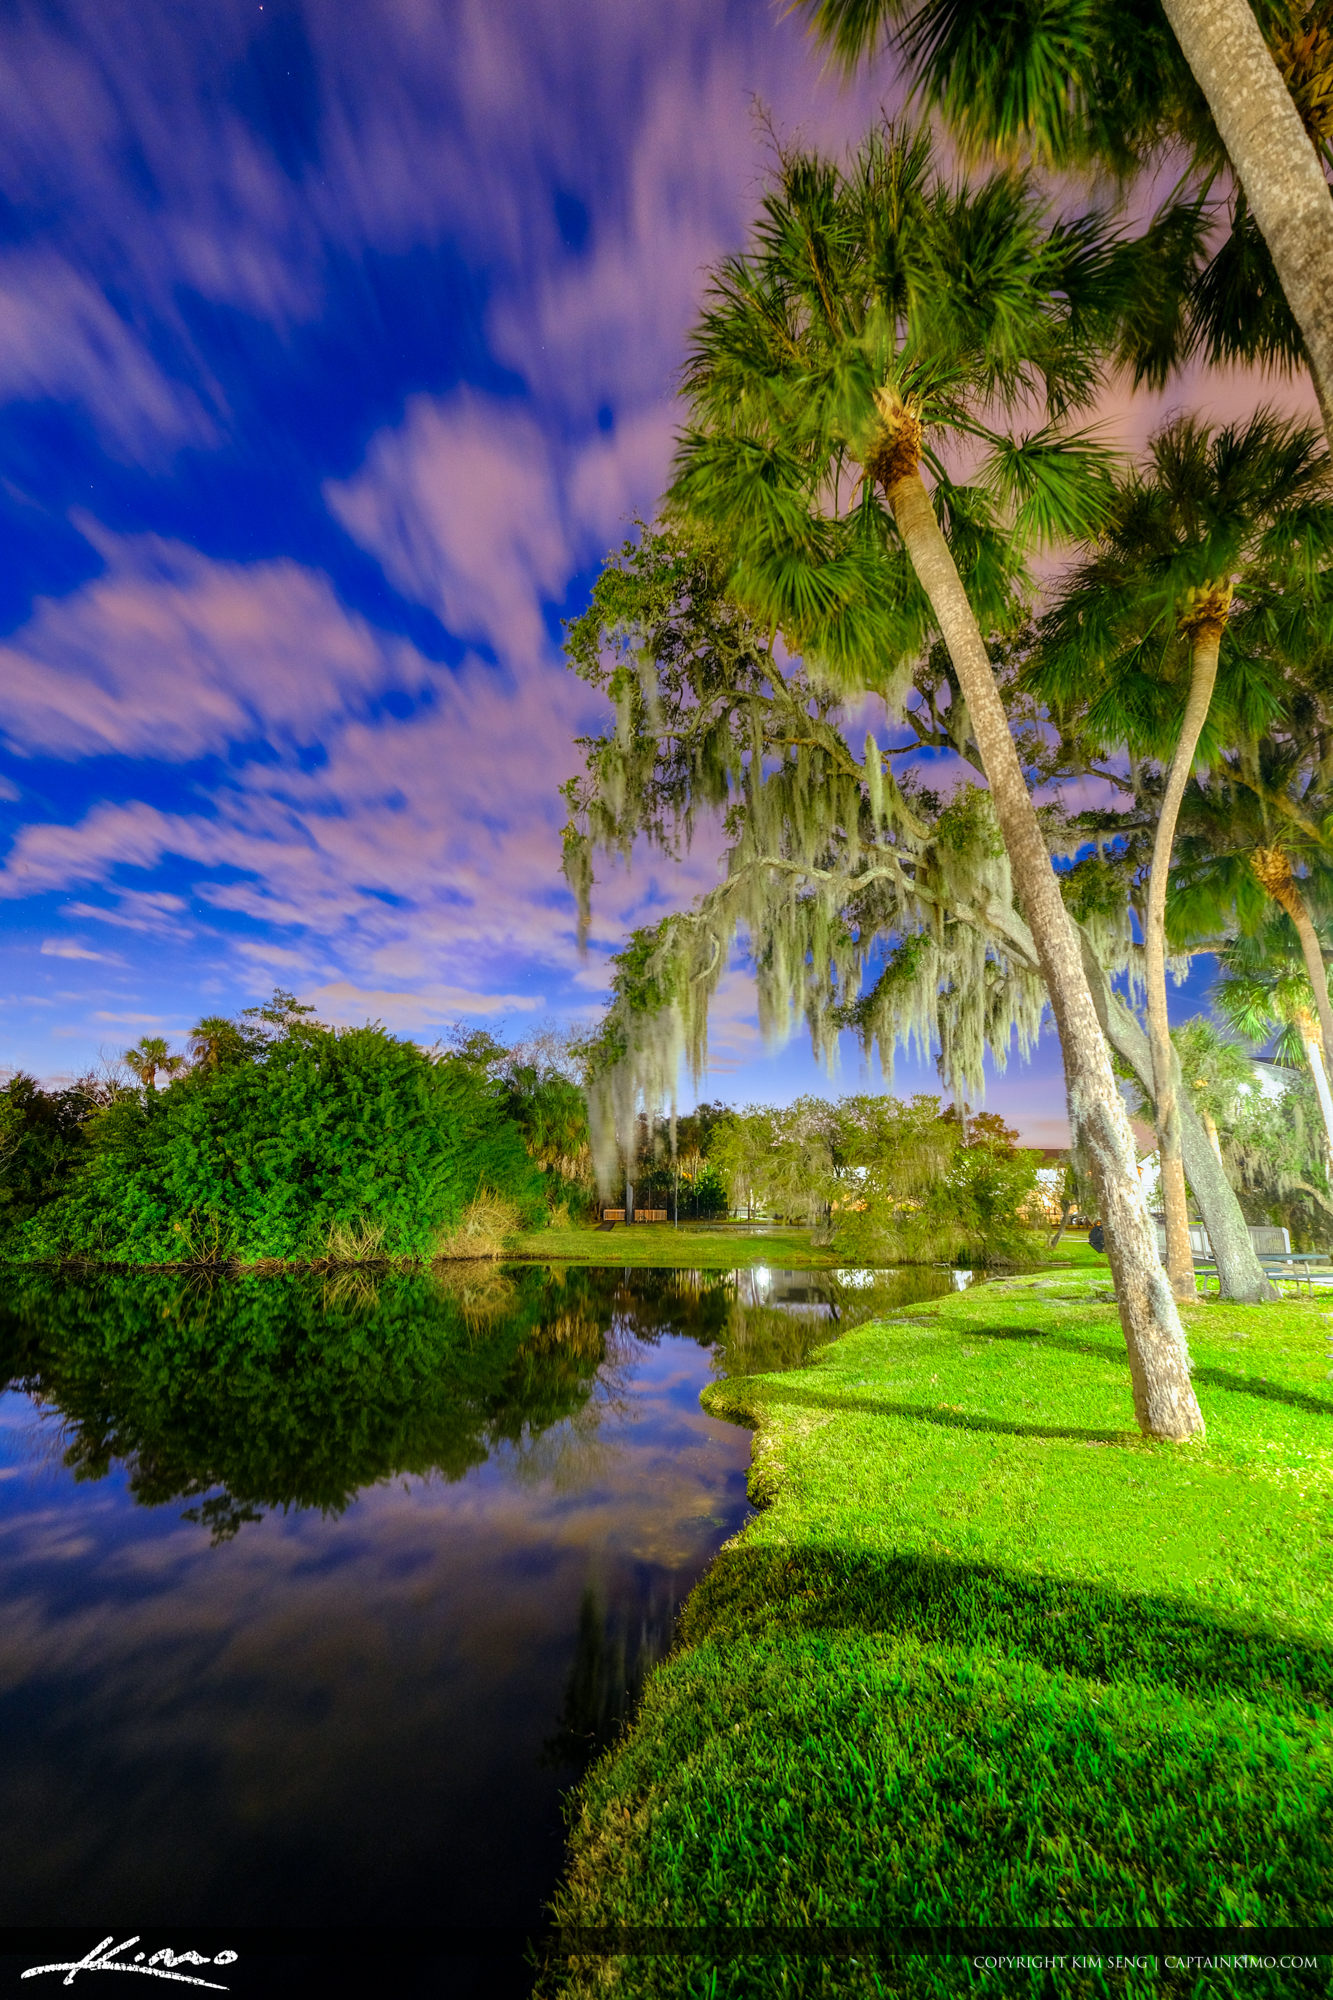 Tampa Florida BBQ Picnic Area